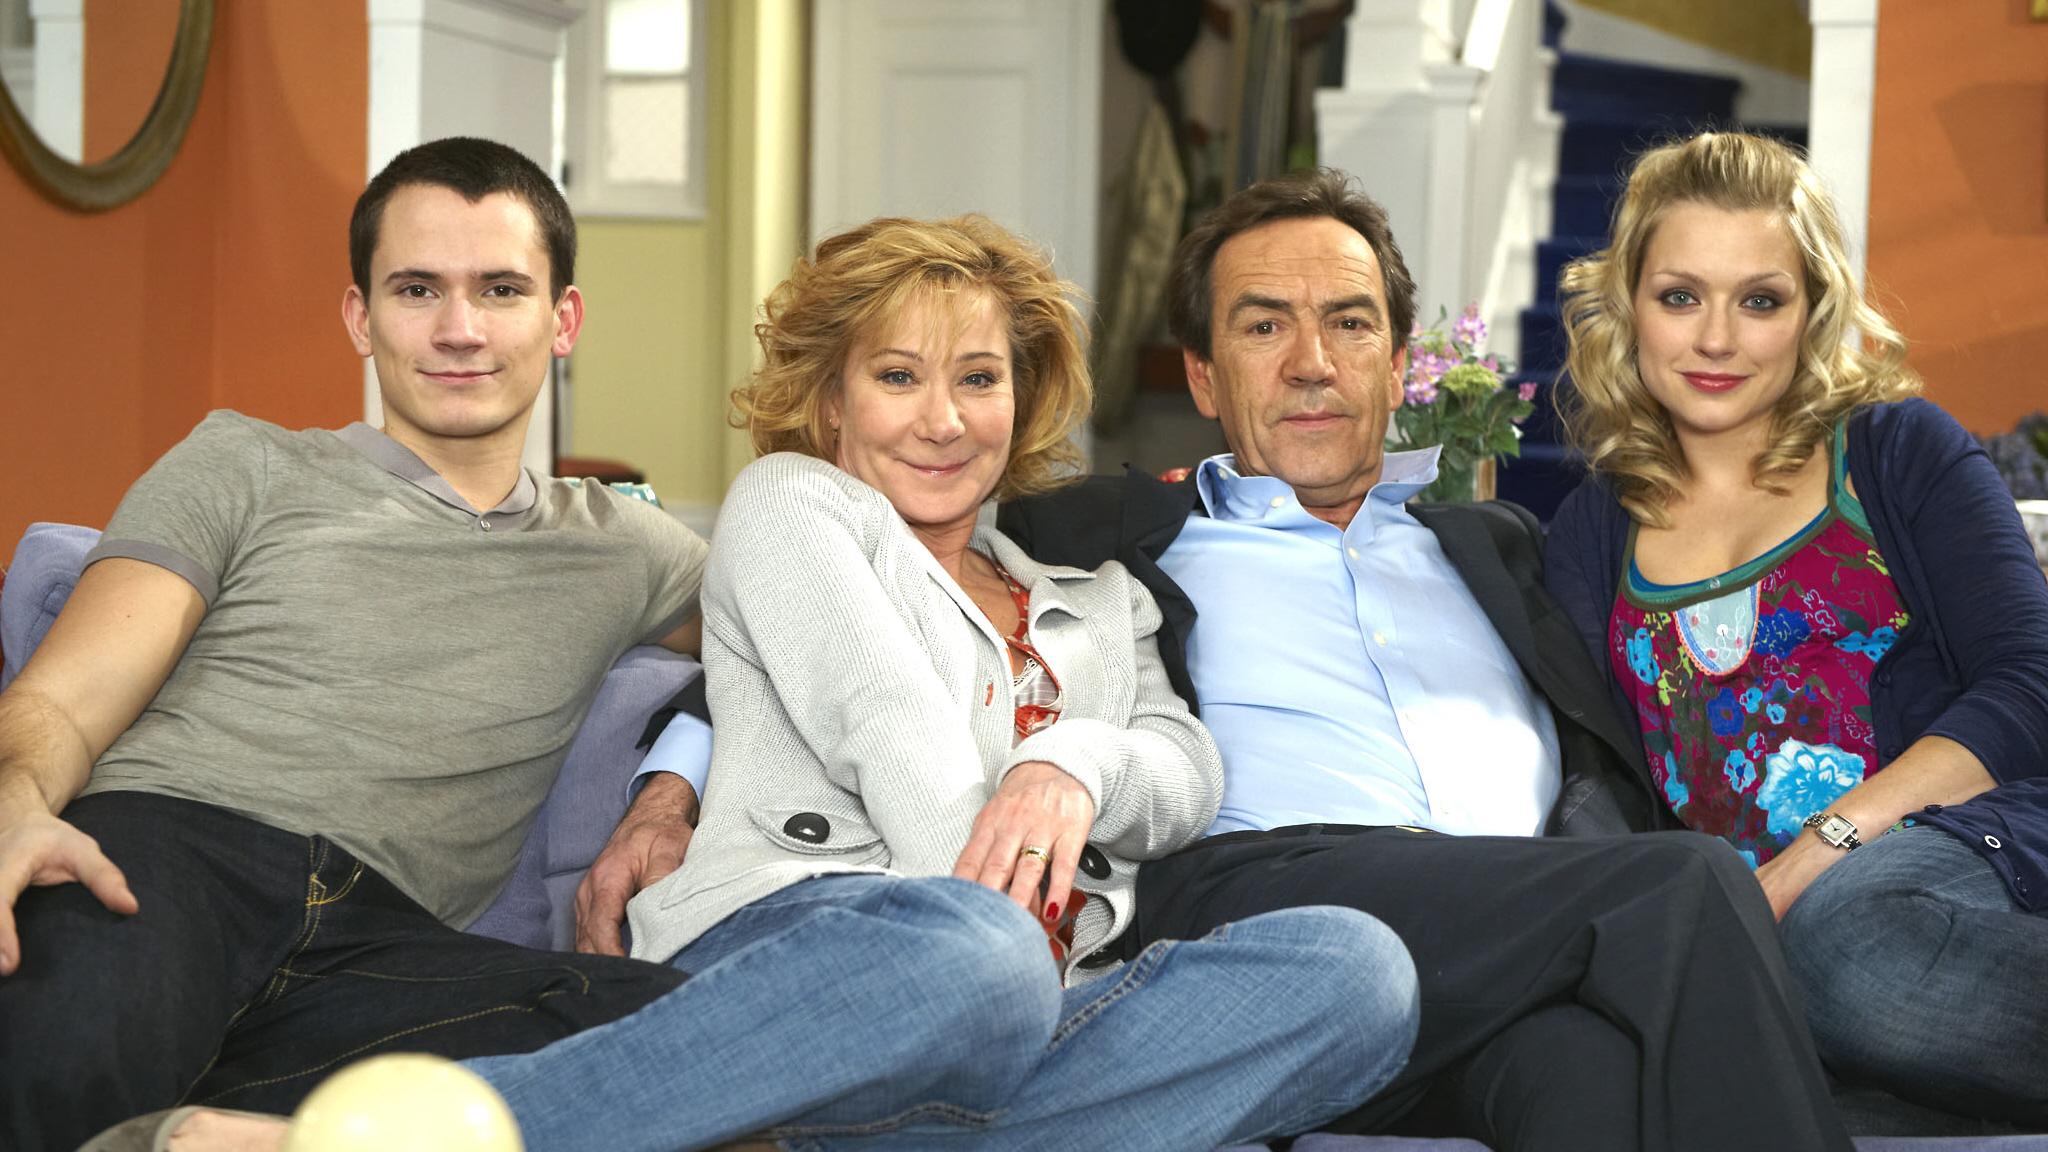 My Family [TV Series]